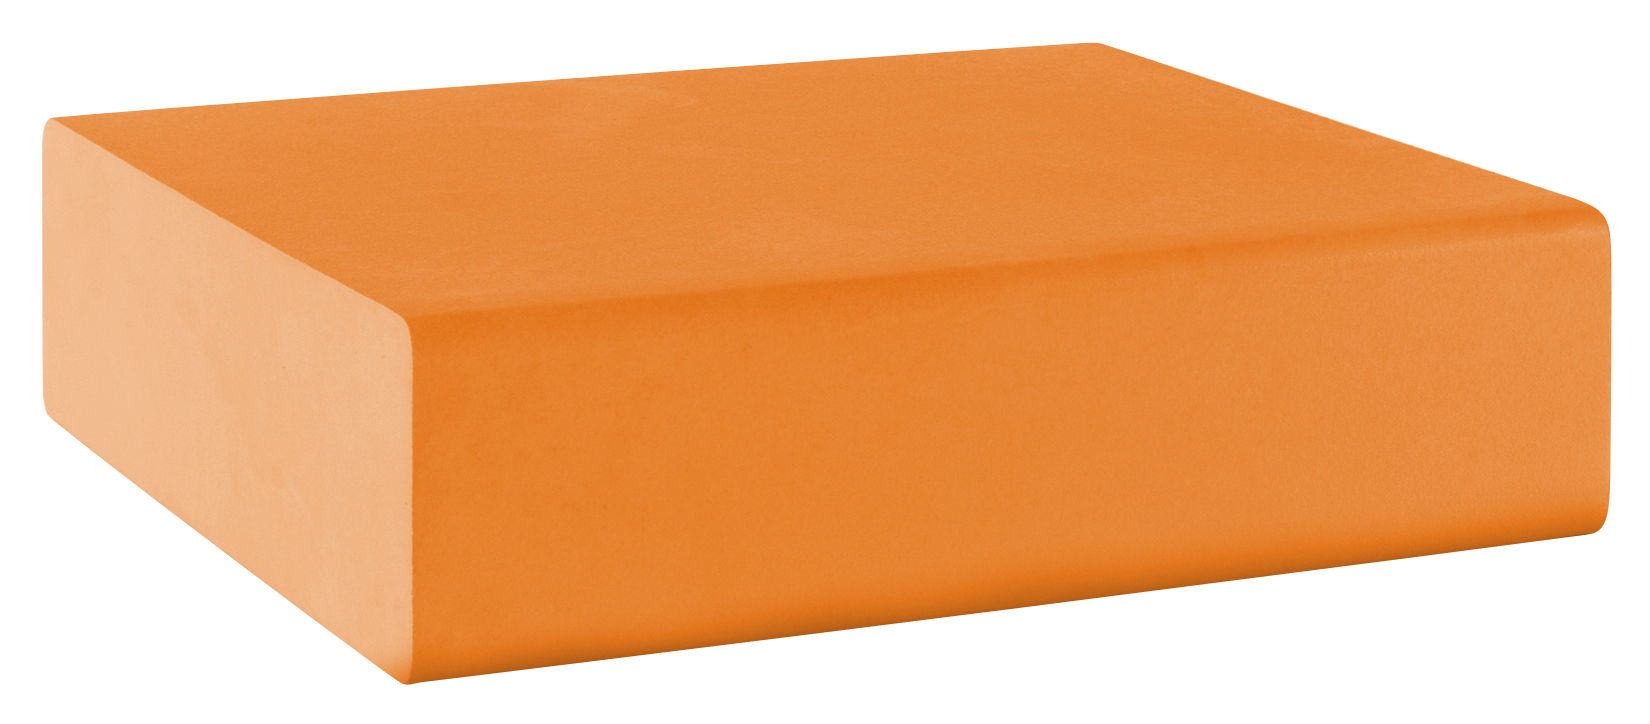 Furniture - Teen furniture - Matrass Mat 75 Pouf by Quinze & Milan - Orange - Polyurethane foam